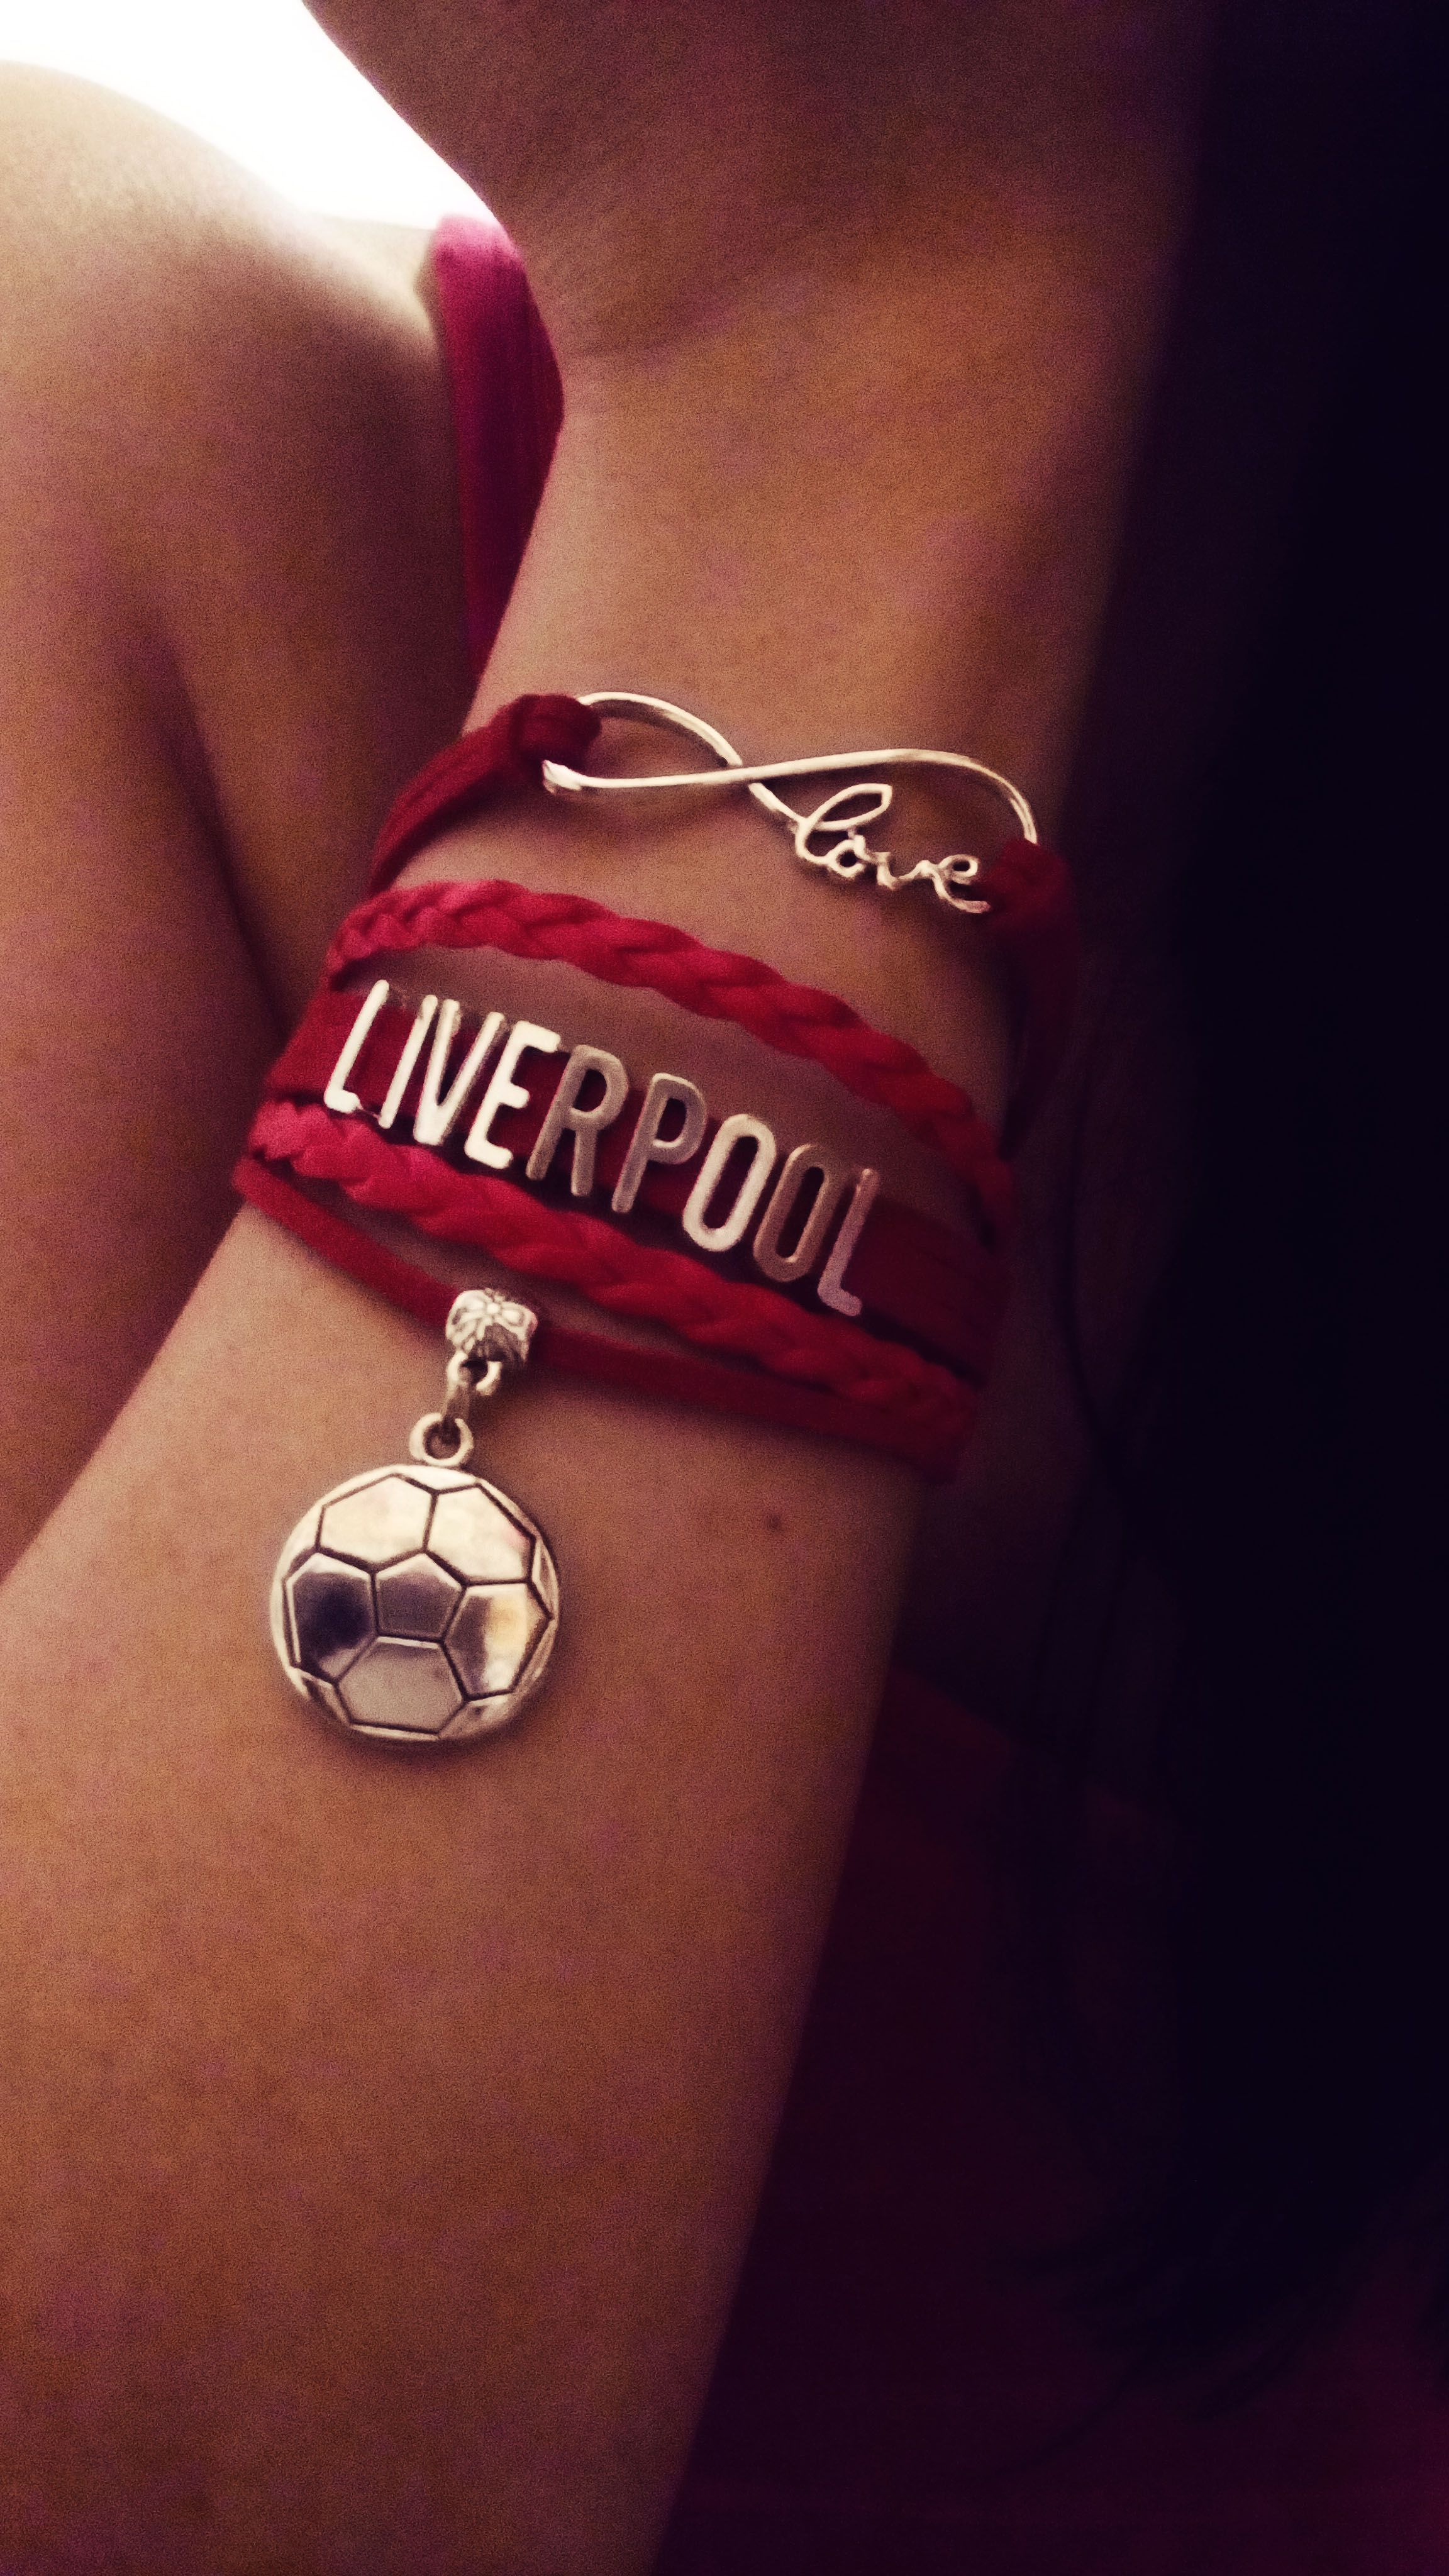 4cf916e00b4 Never ending love - Liverpool Fc. YNWA 26.05.2018.